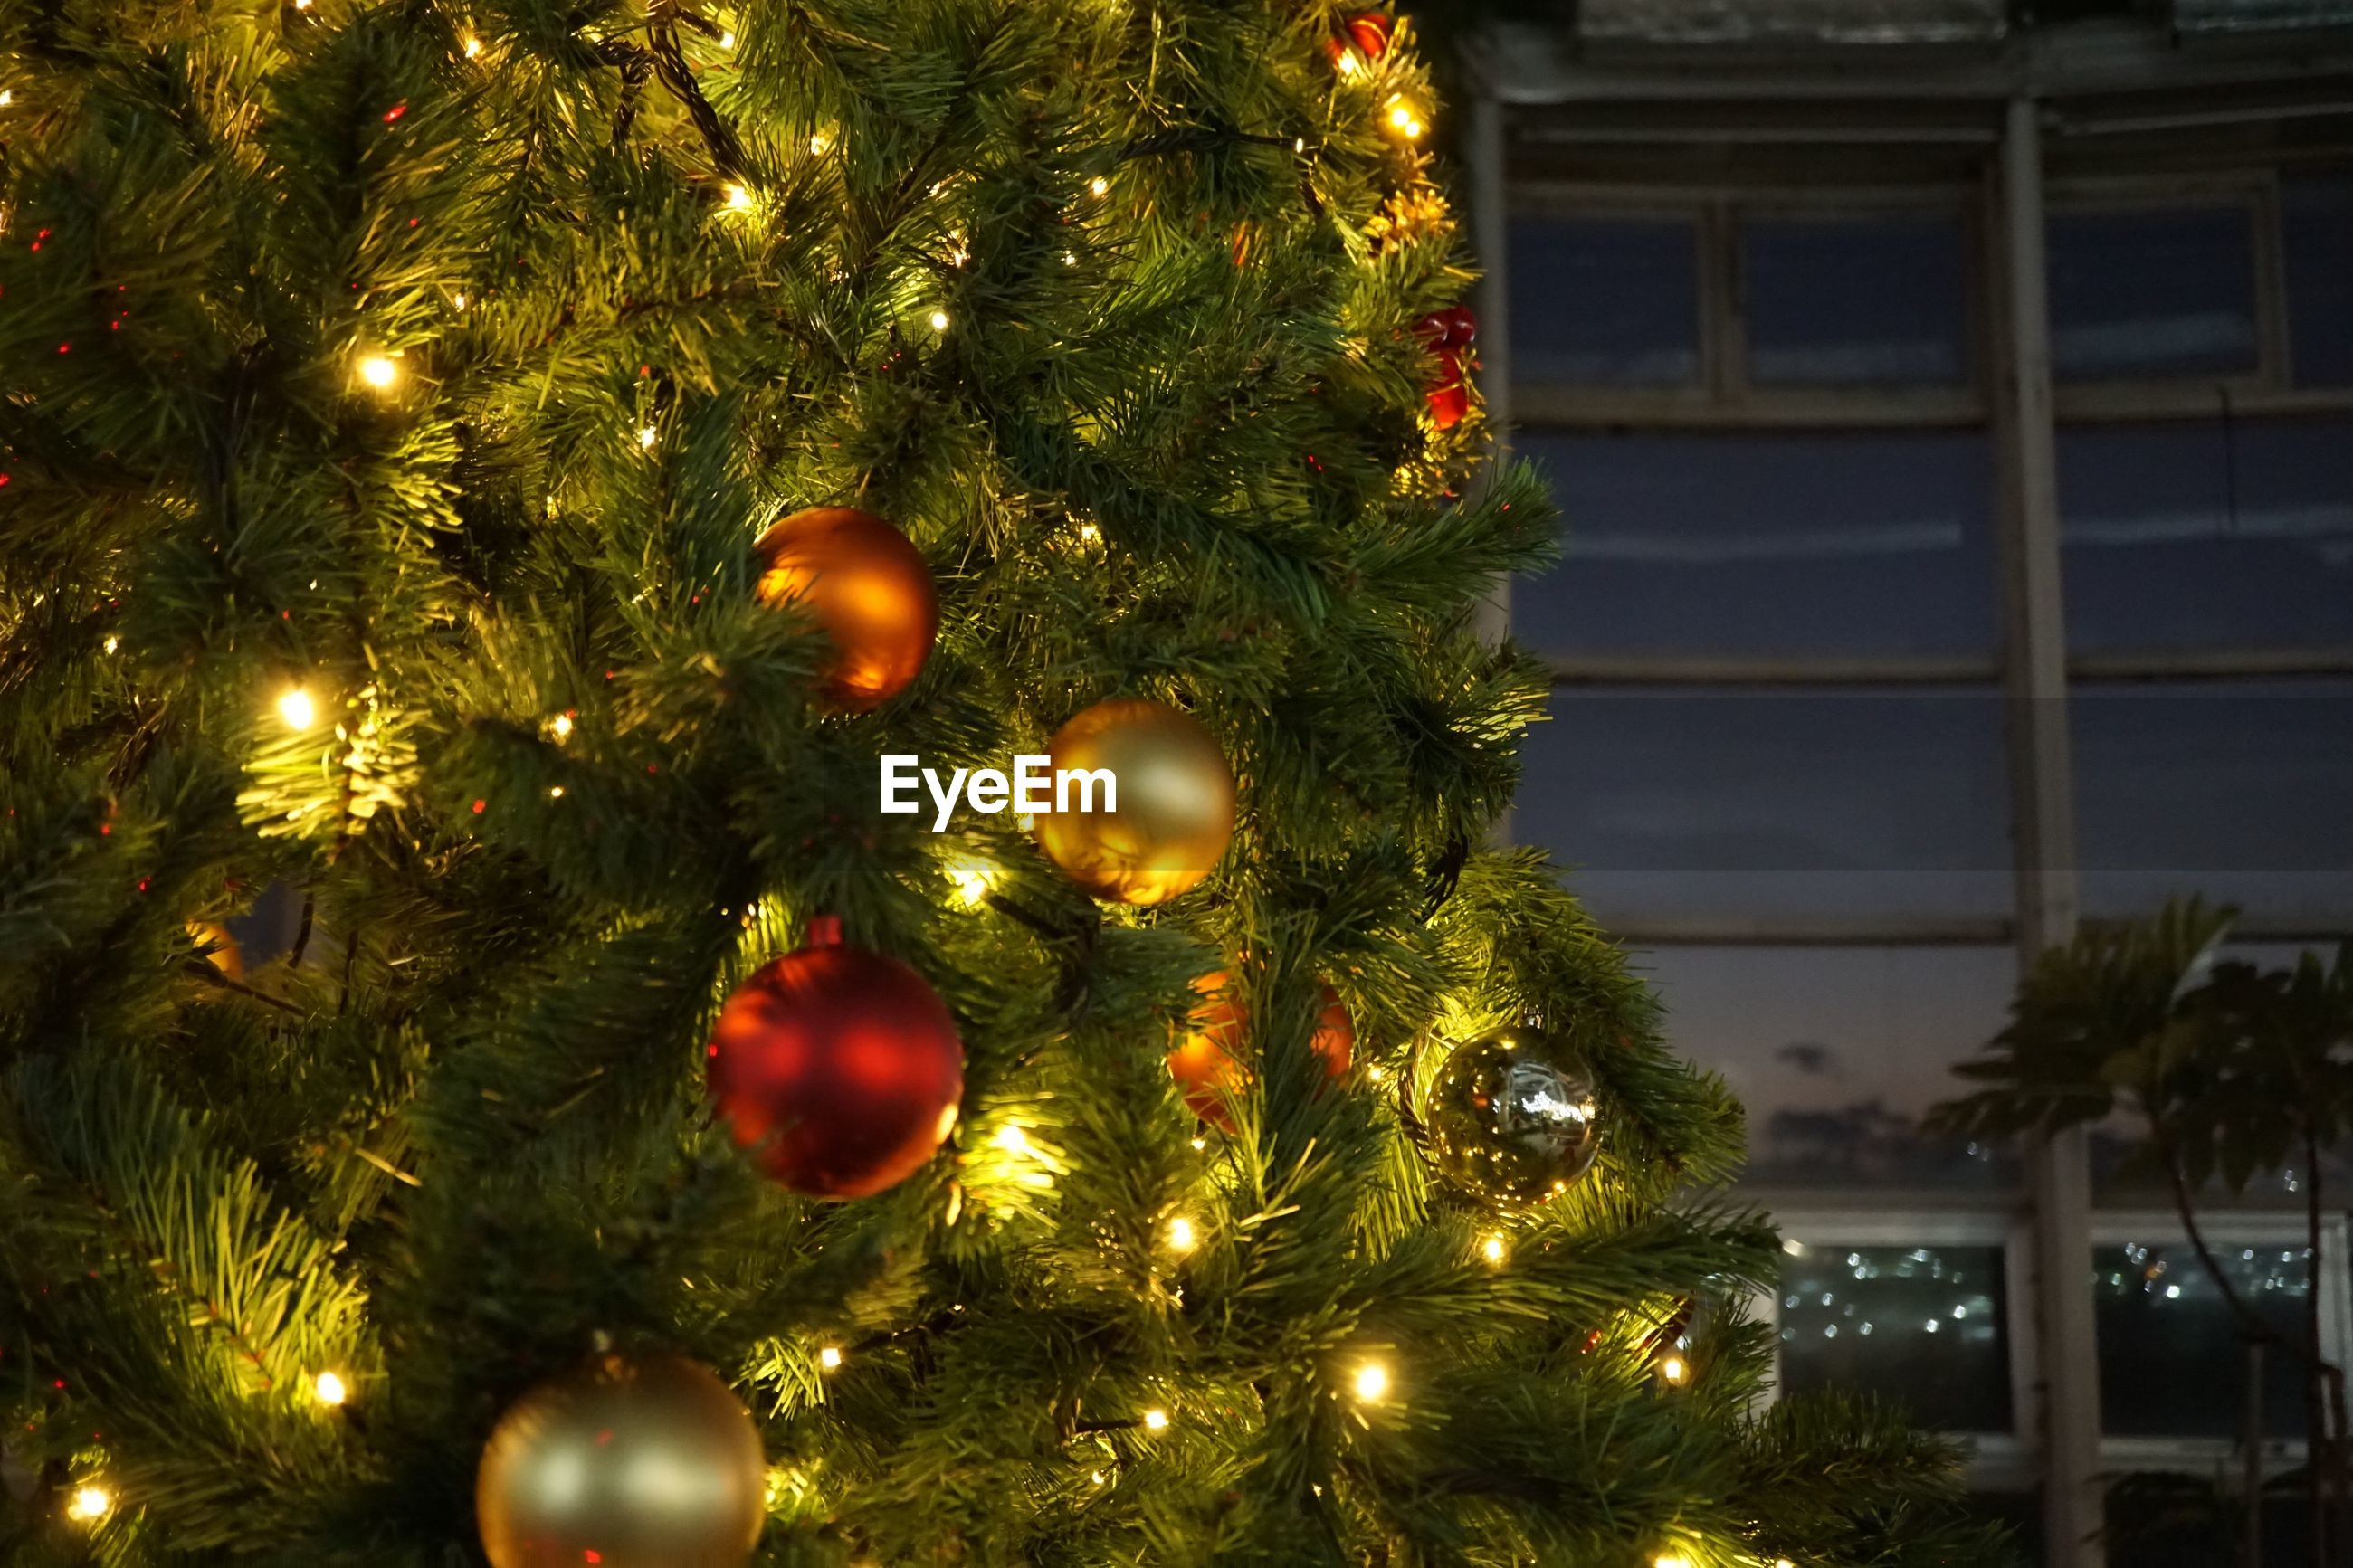 christmas, tree, christmas tree, decoration, celebration, christmas decoration, holiday, illuminated, christmas ornament, christmas lights, no people, holiday - event, green color, hanging, celebration event, plant, night, focus on foreground, close-up, light